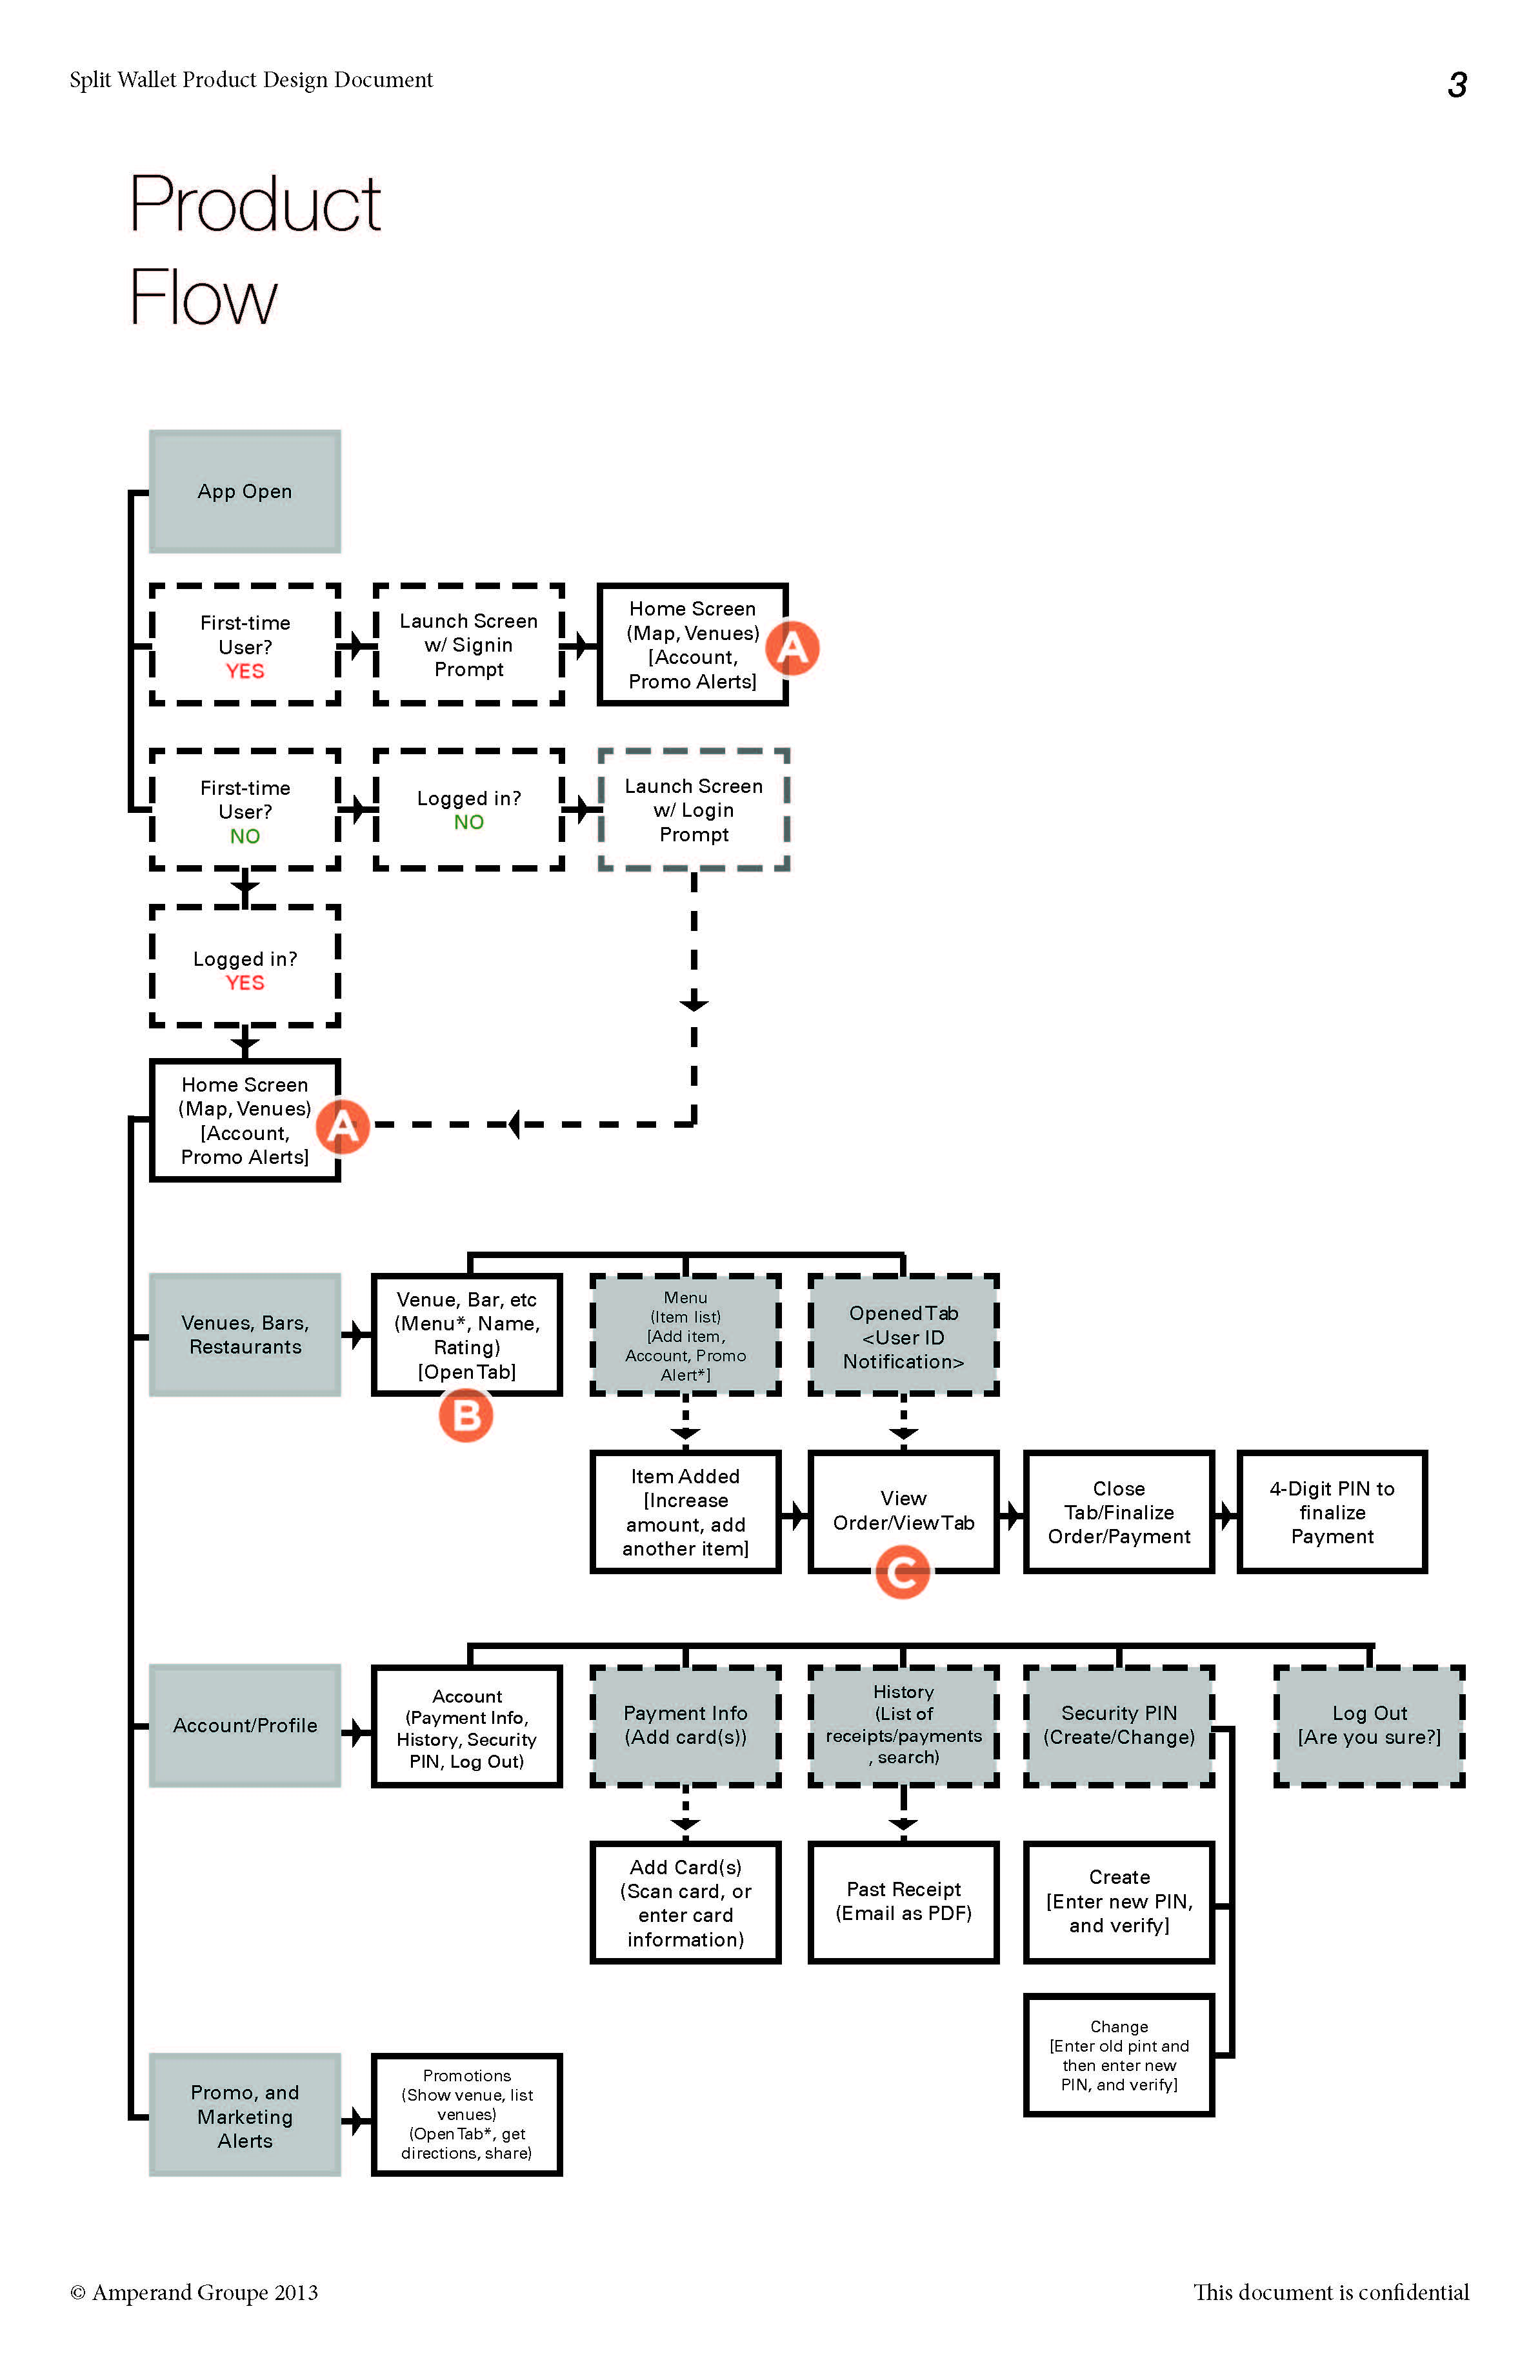 High-level user app flow